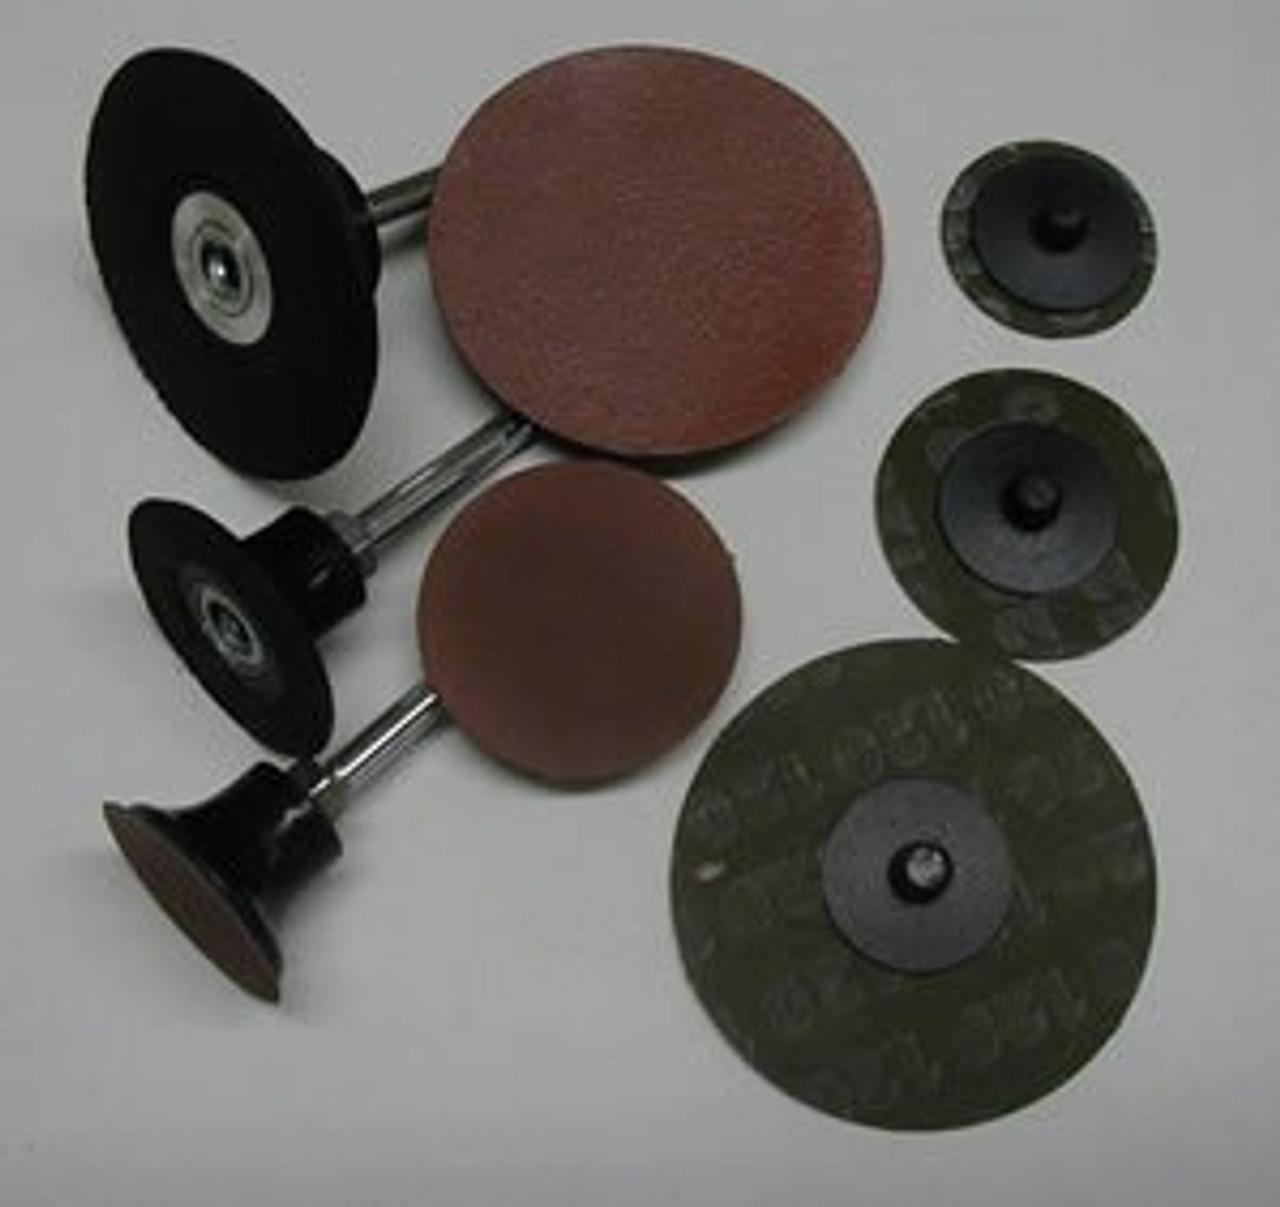 "Aluminum Oxide Sanding Disk 2"" - 80 Grit"